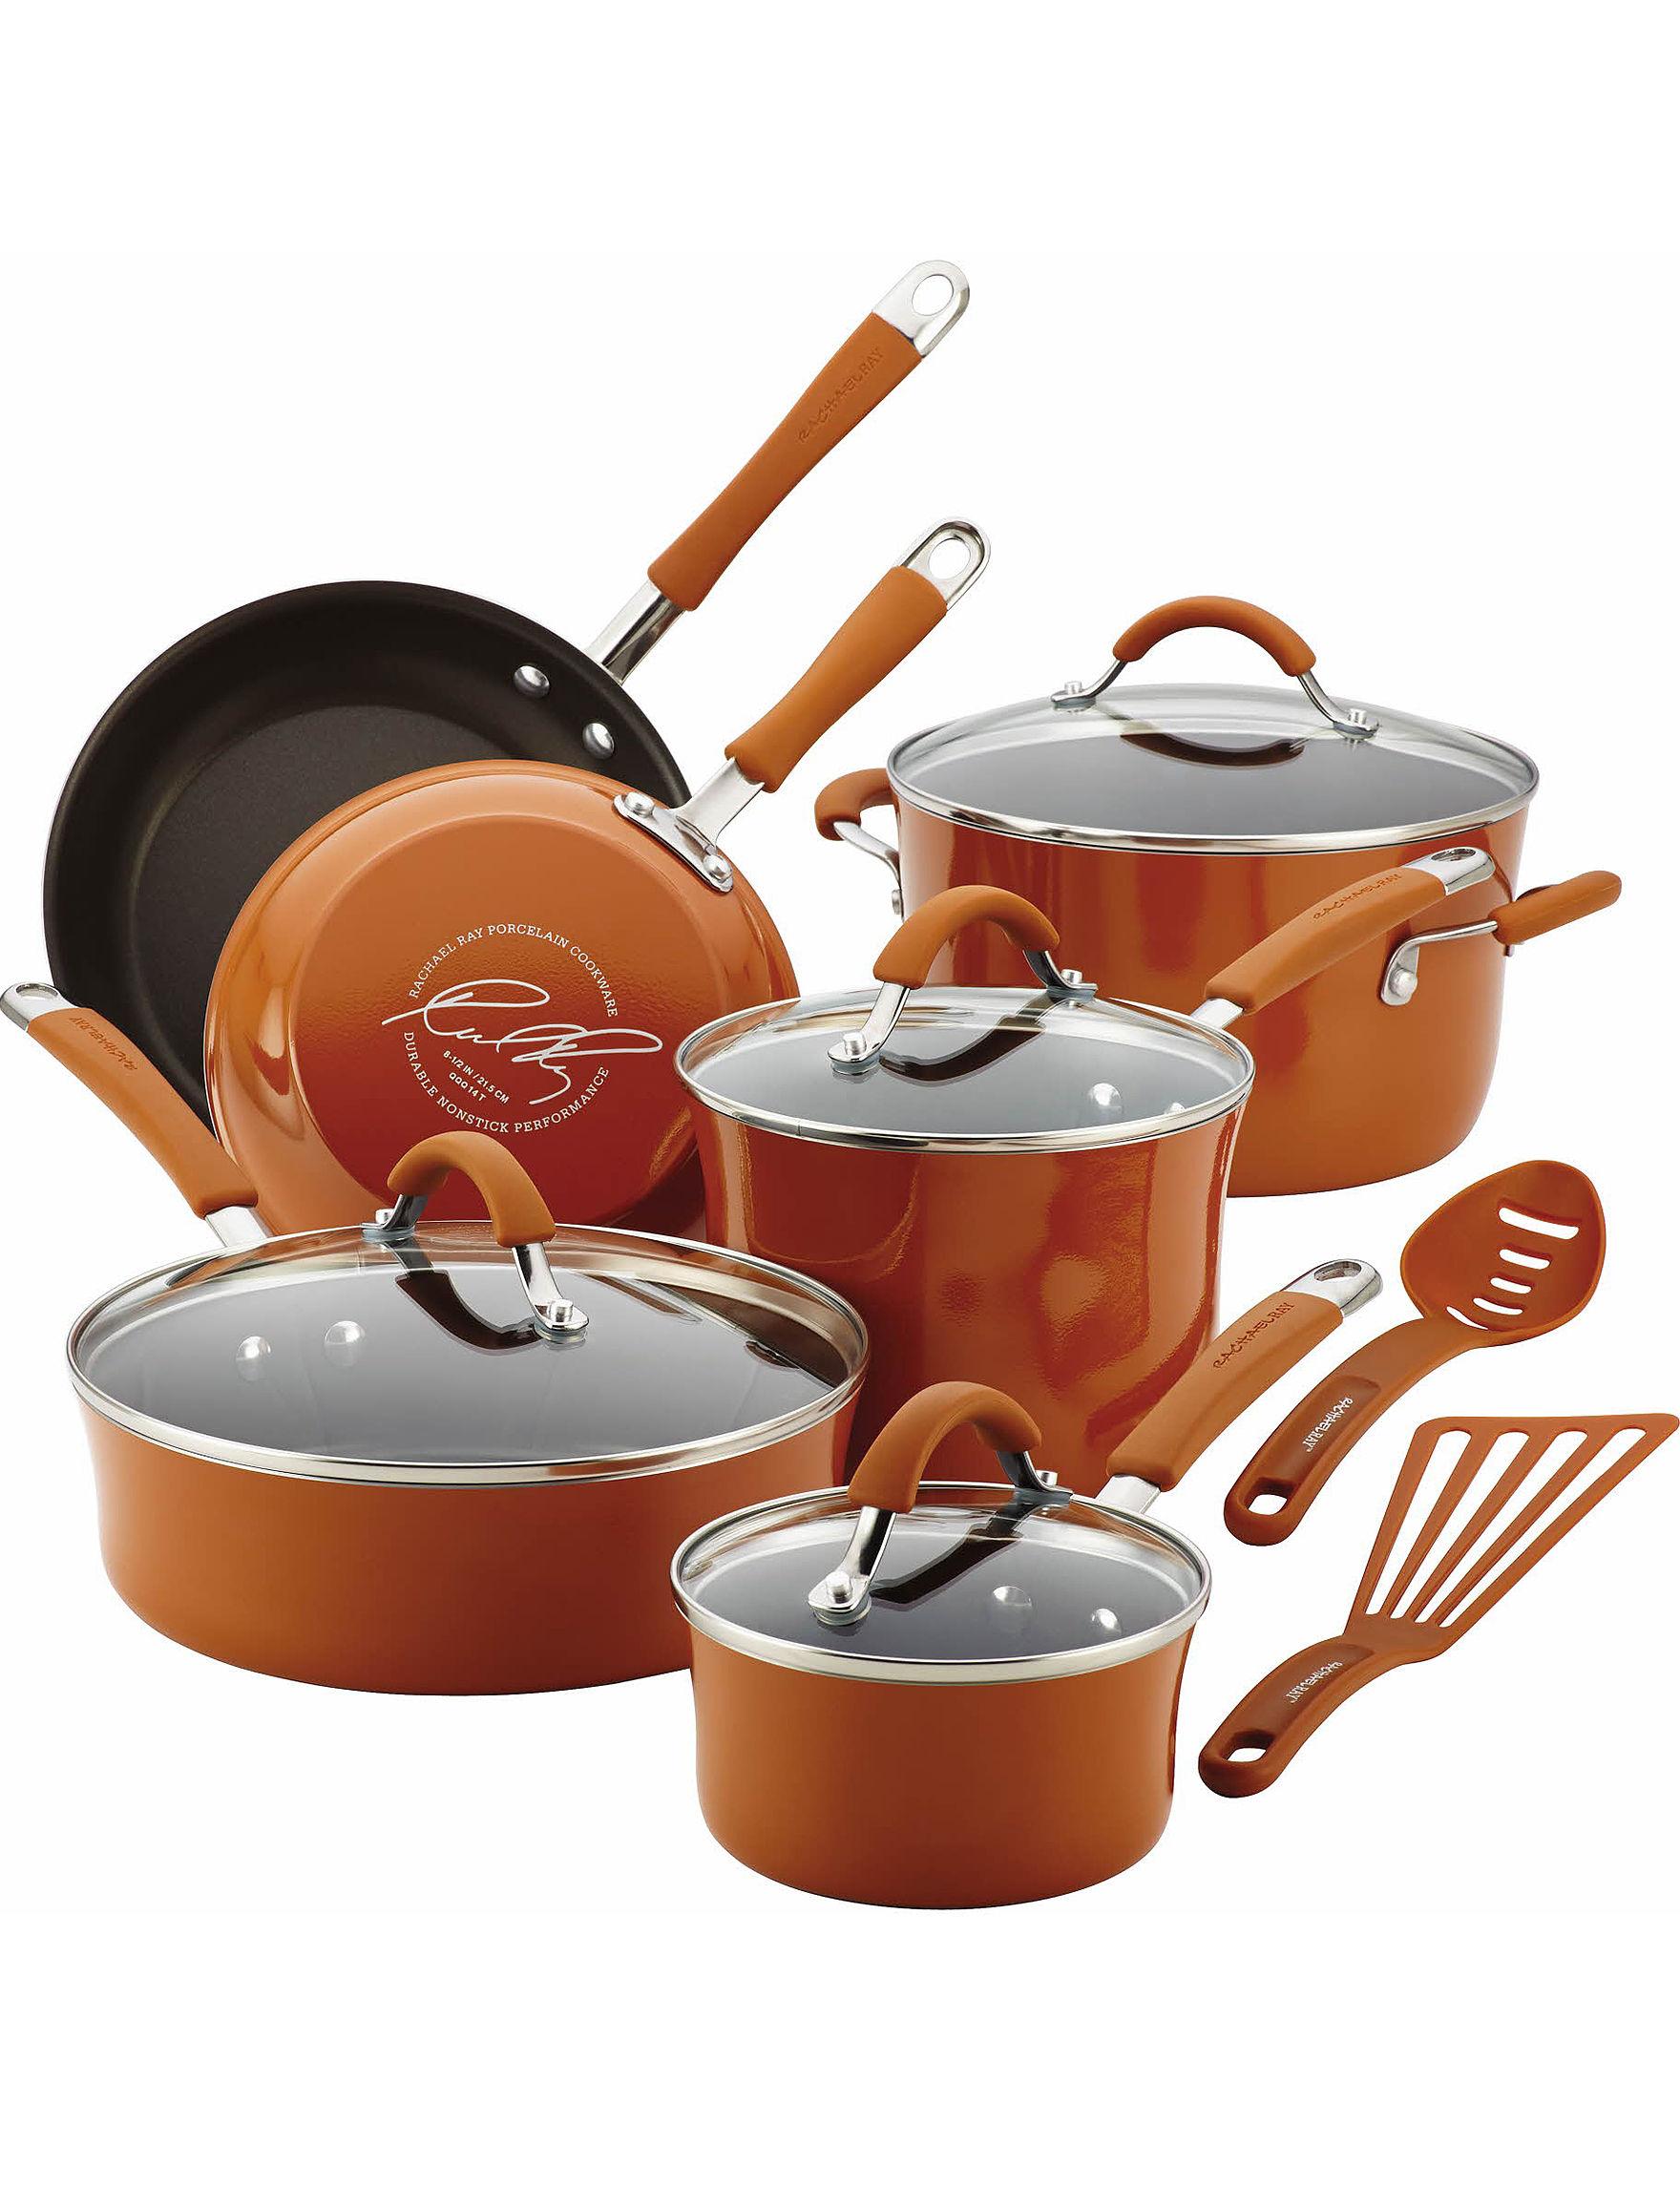 Rachael Ray Orange Cookware Sets Cookware